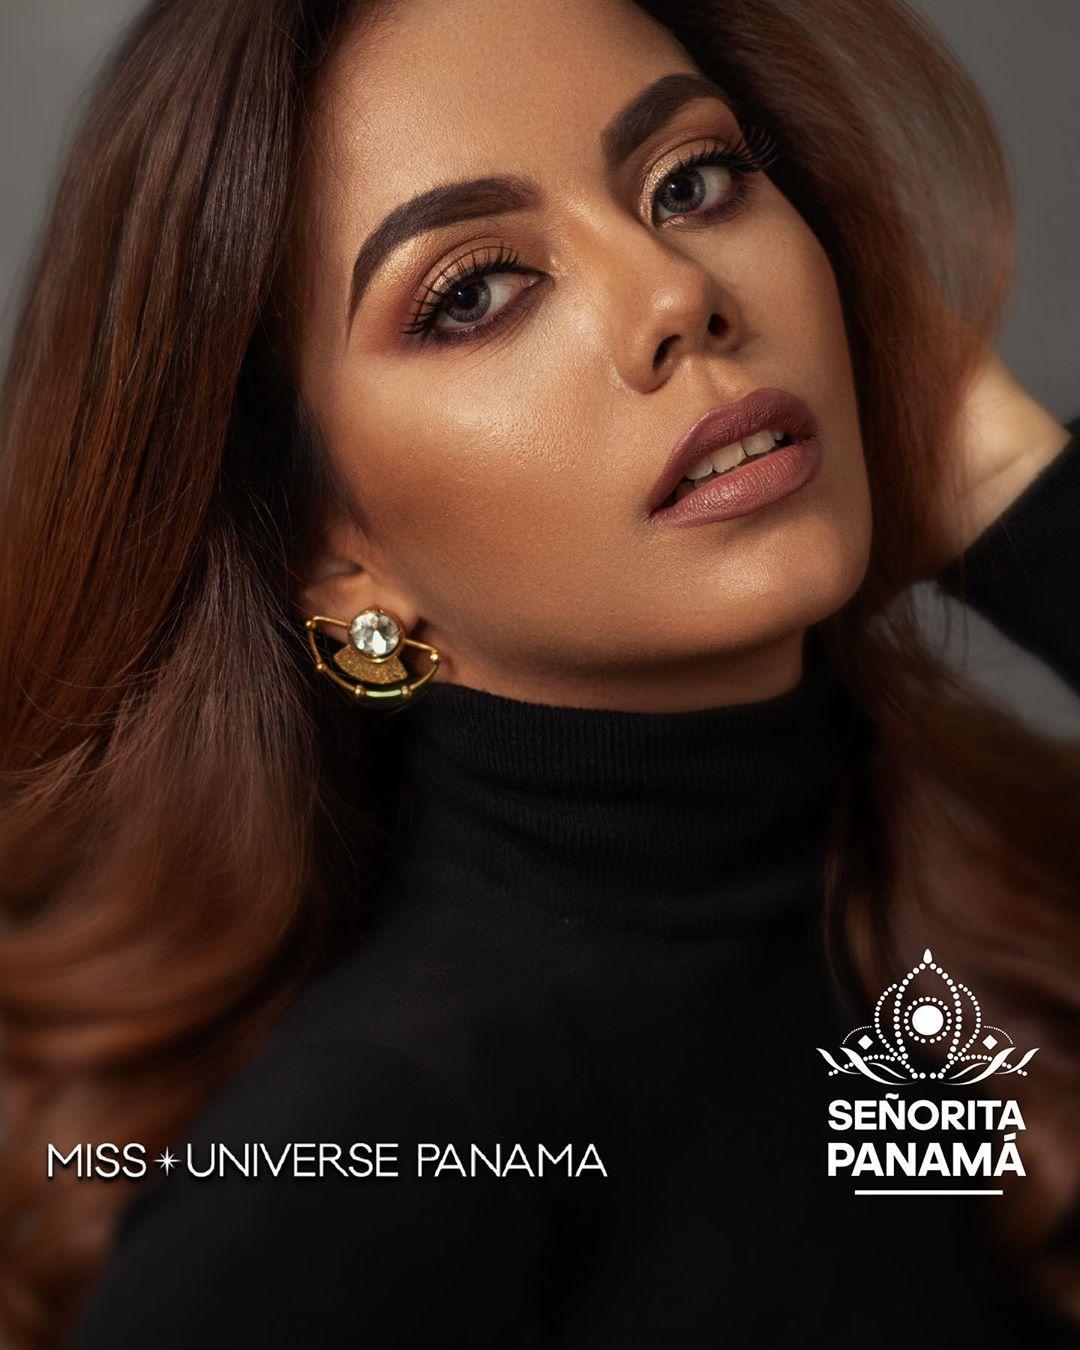 candidatas a senorita panama 2020. final: 16 may. IitdZl